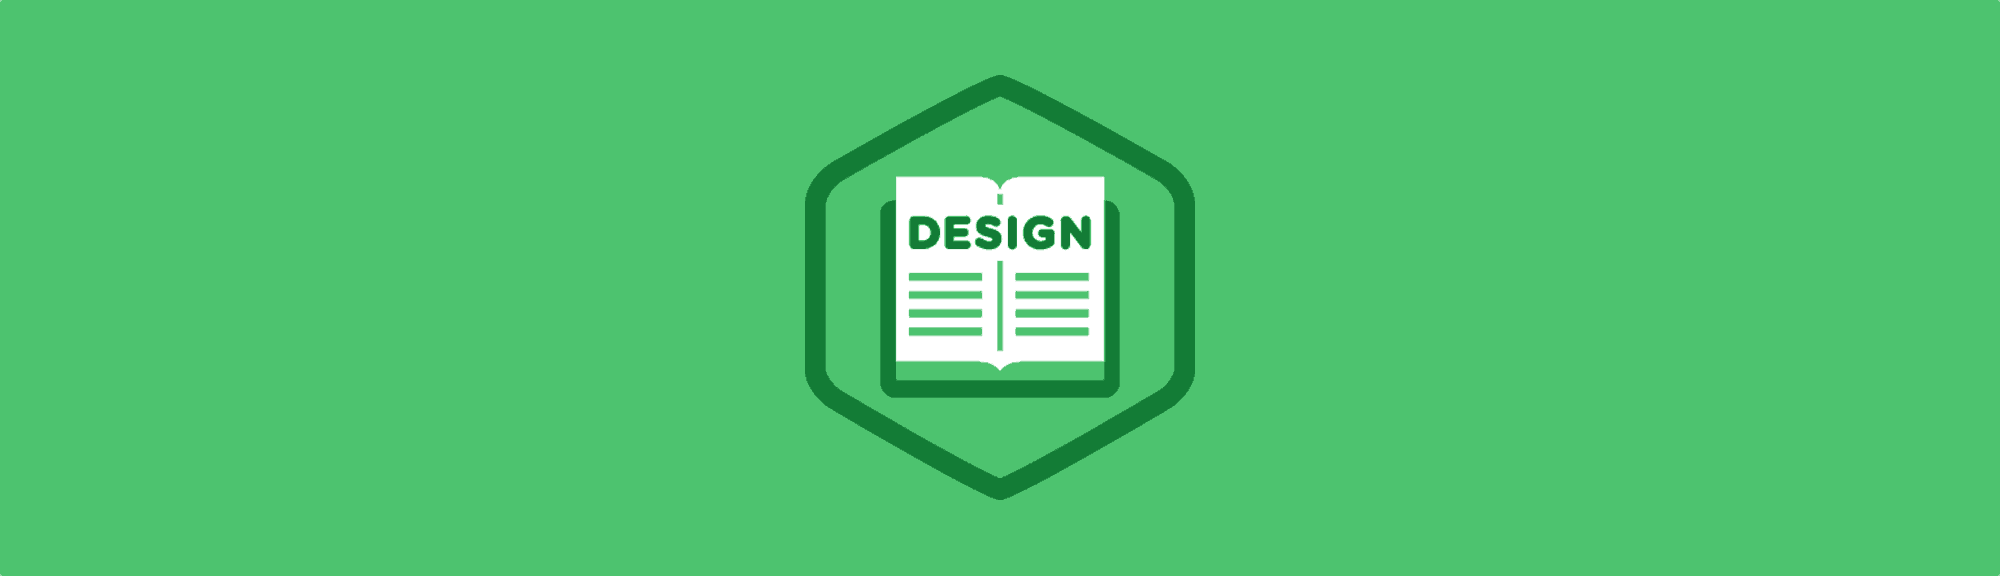 blogging blog blogger Web Usability Design